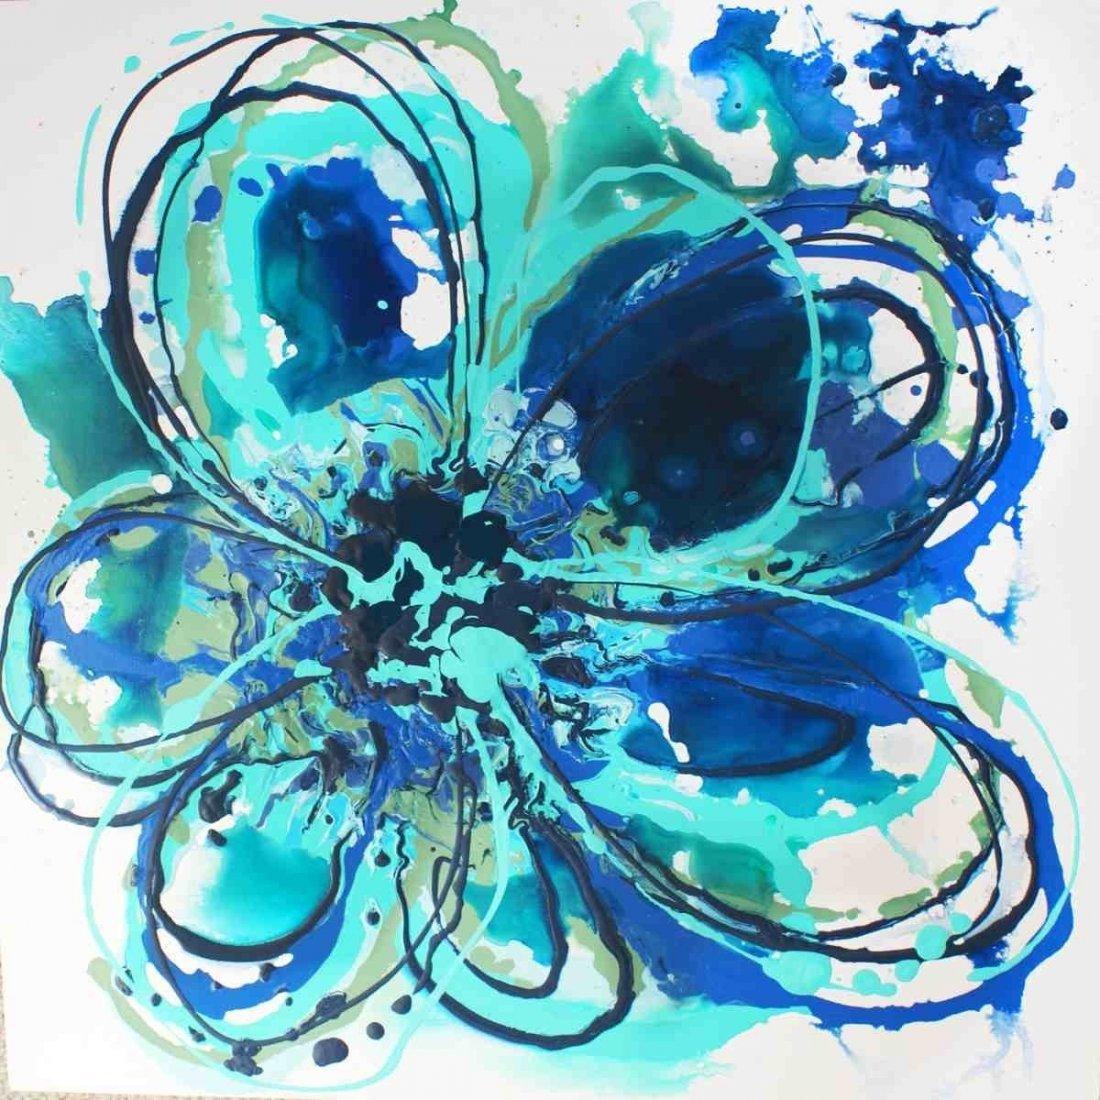 "Blue Abstract Splash, Irena Orlov, Acrylic-canvas24x24"""